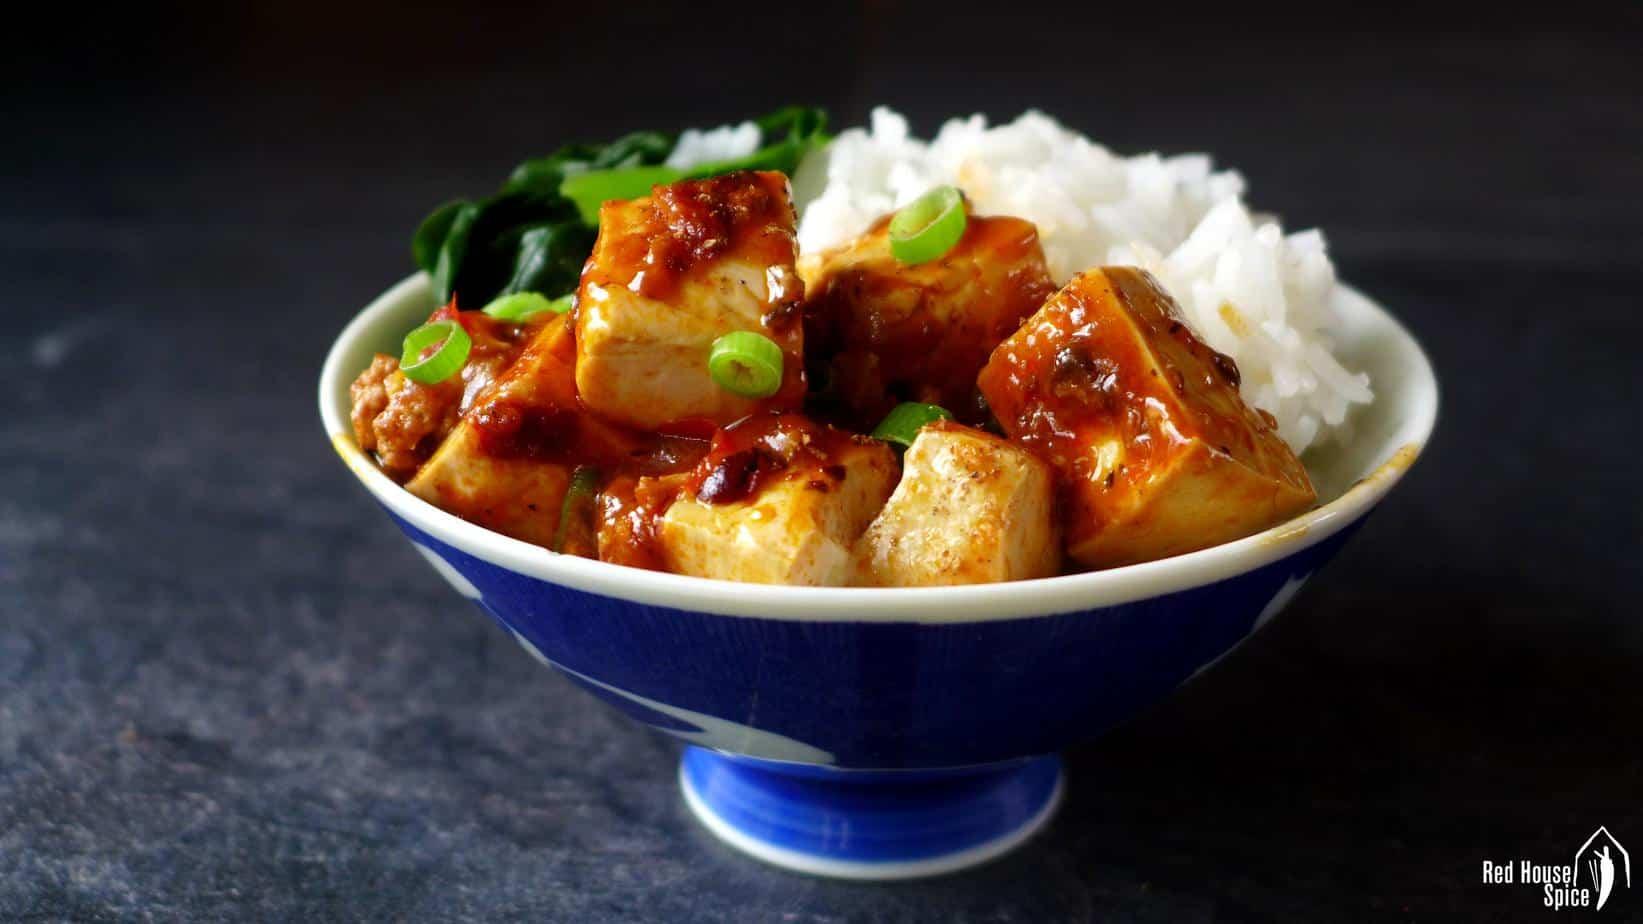 Tofu mapo sur un bol de riz nature